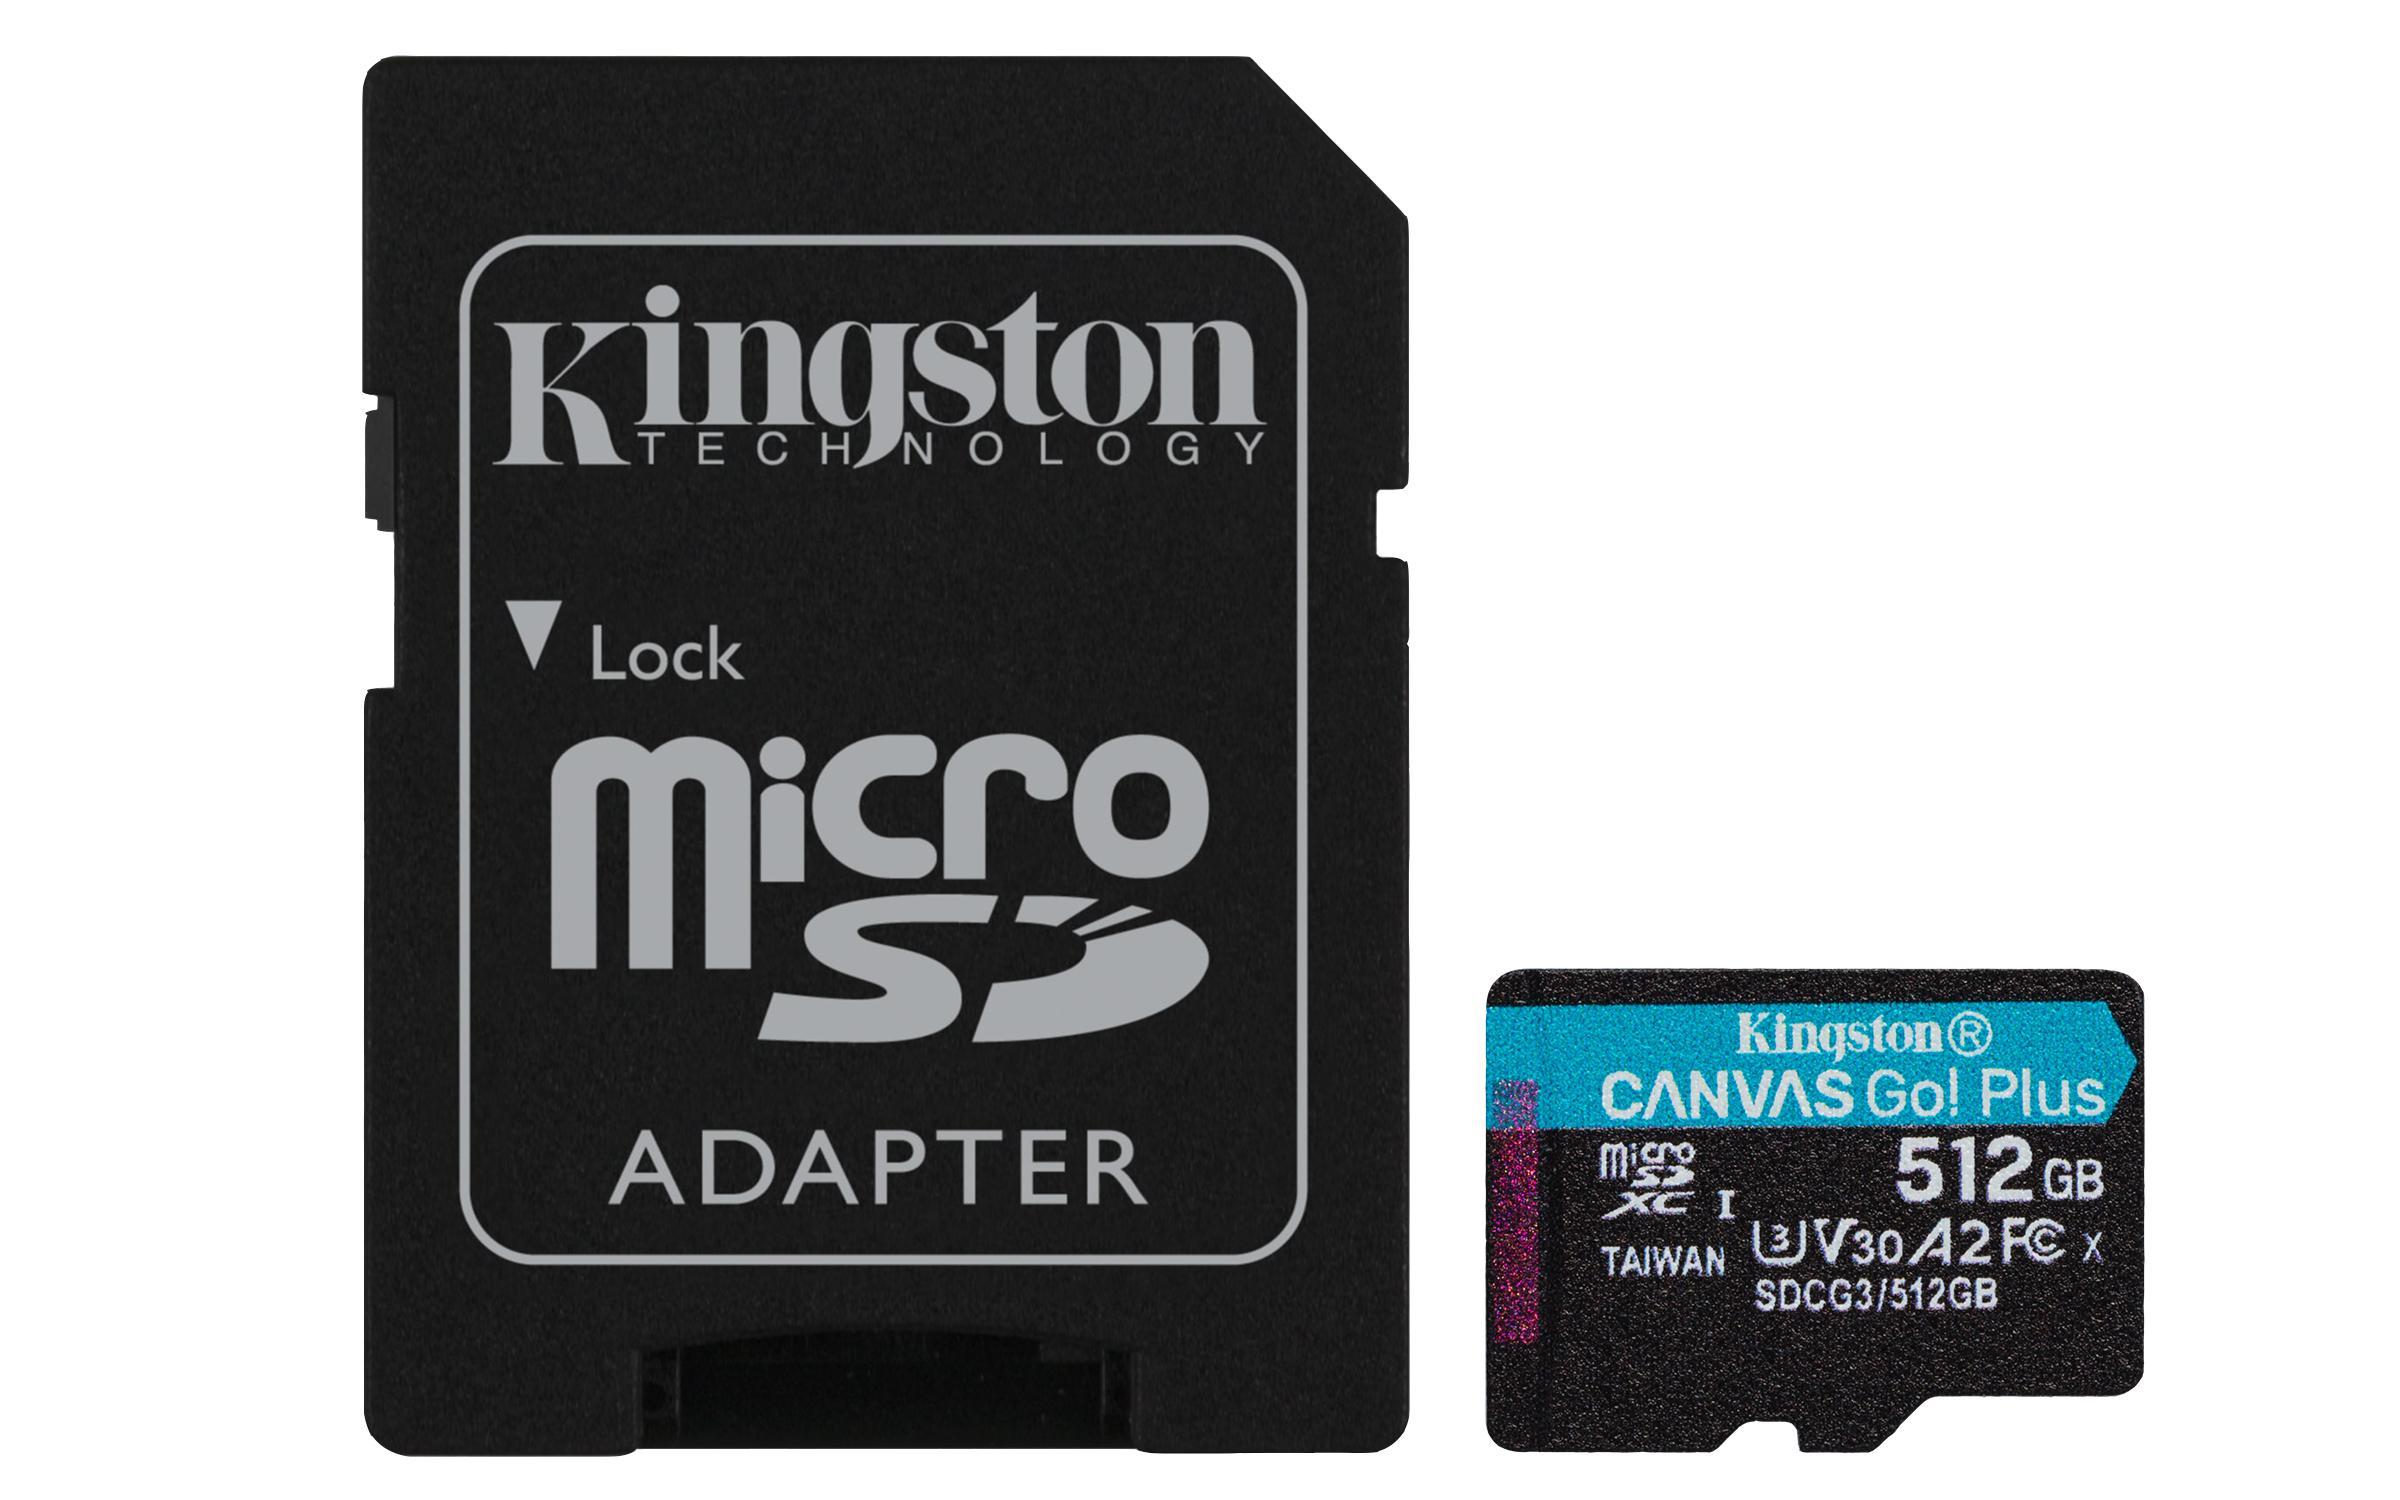 Карта памет Kingston Canvas Go! Plus, 512GB, UHS-I, Class 10, U3, V30, A2, Адаптер